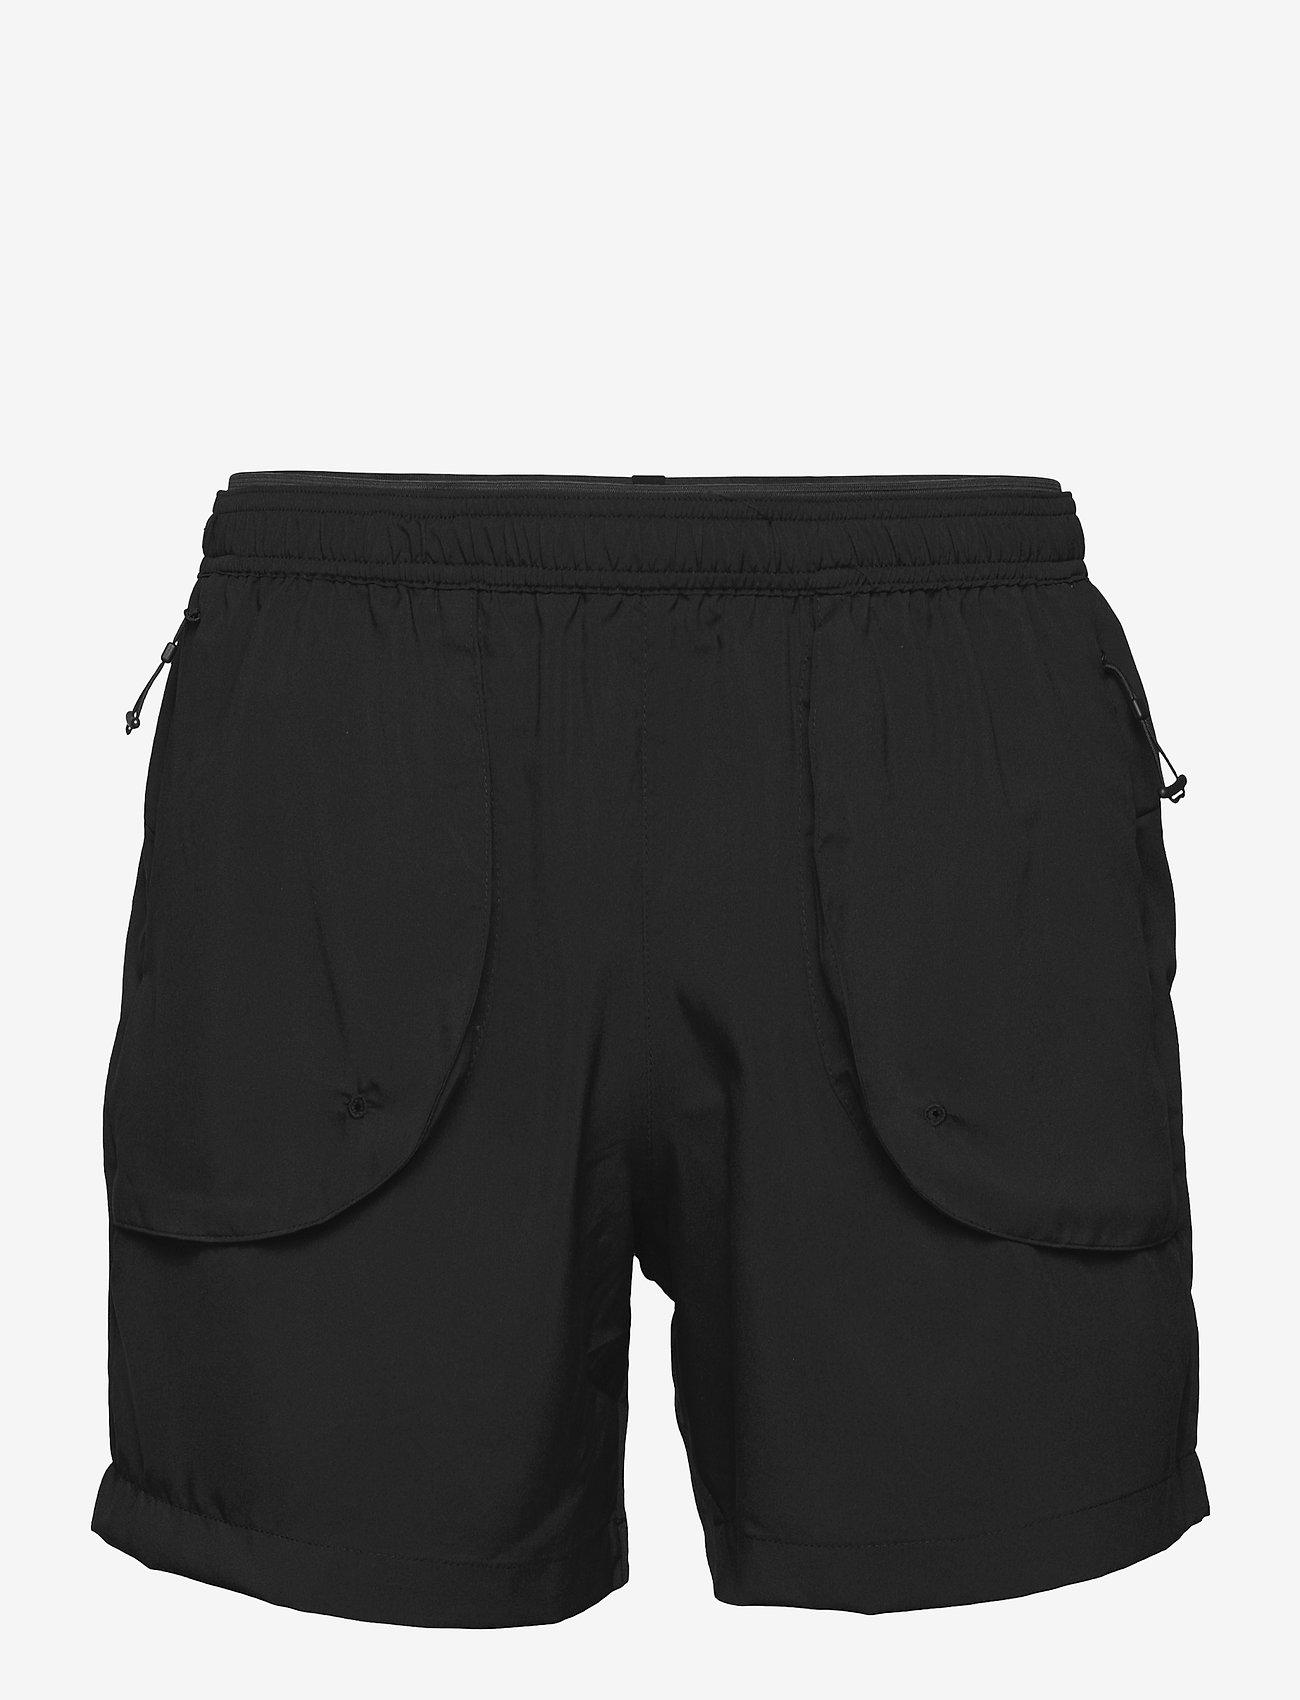 Soulland - Harley shorts - krótkie spodenki - black - 1